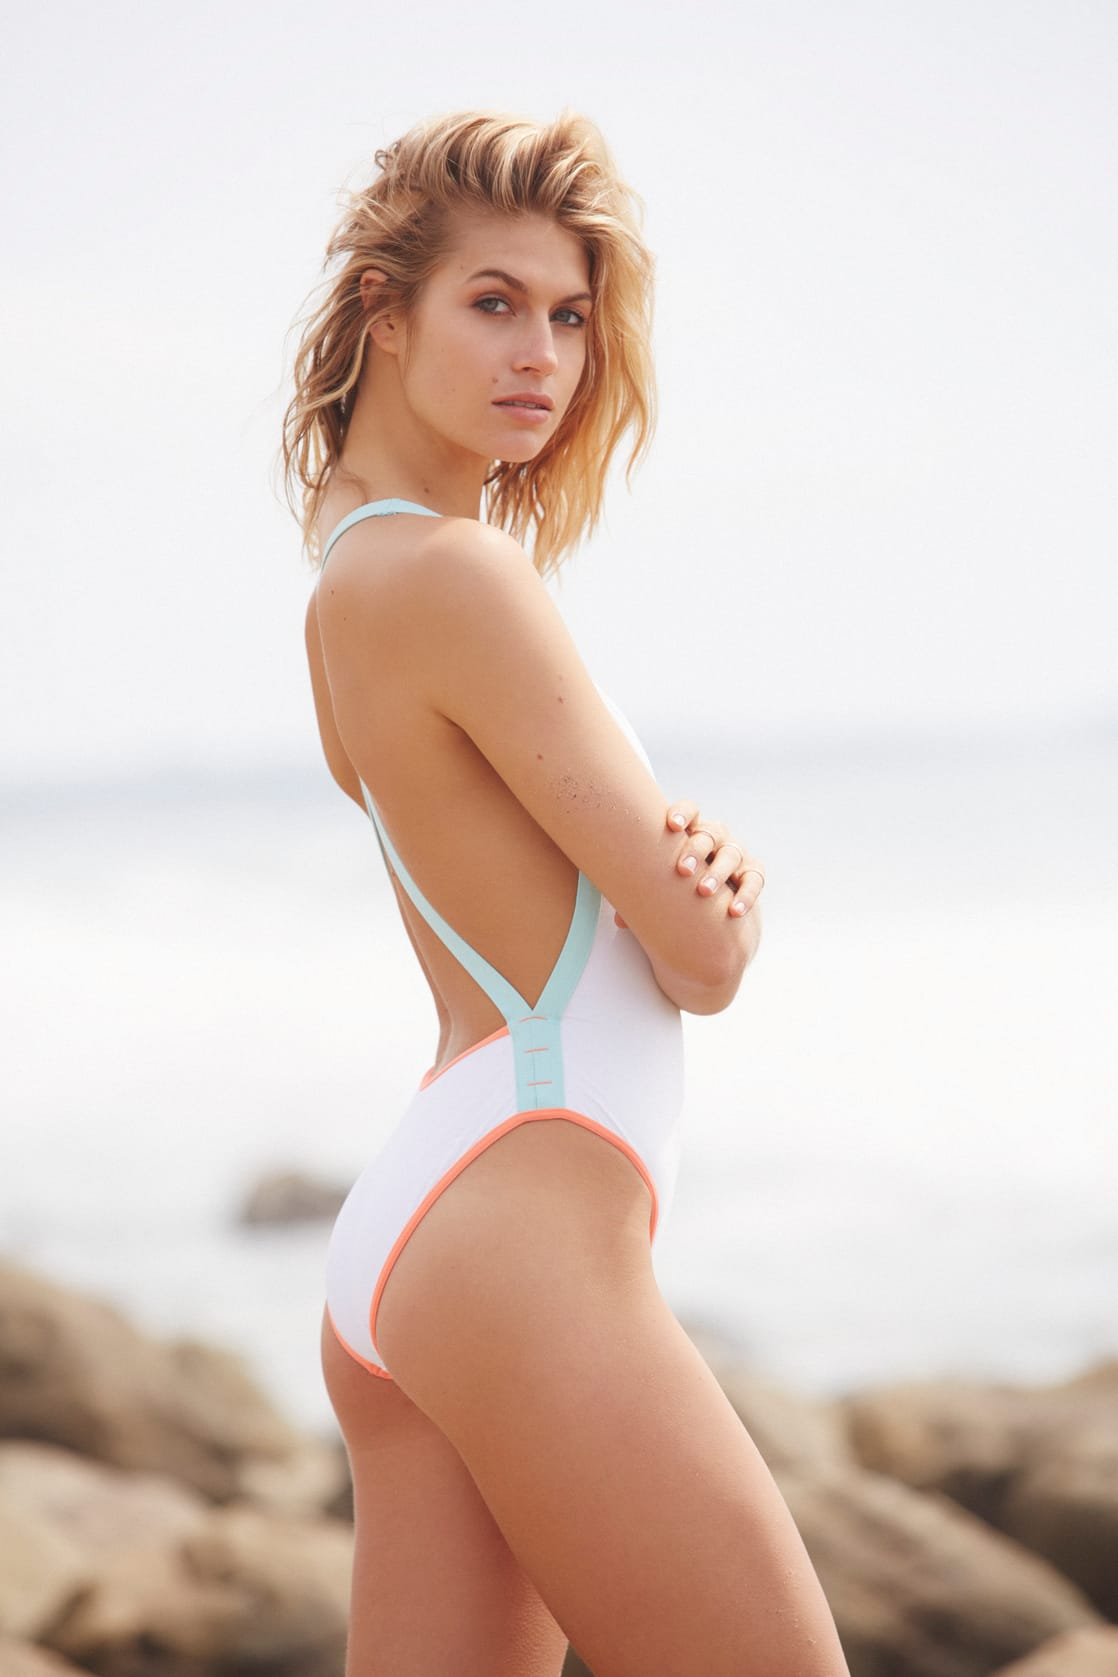 Sexy Annie McGinty naked (49 photos), Tits, Paparazzi, Boobs, cameltoe 2006